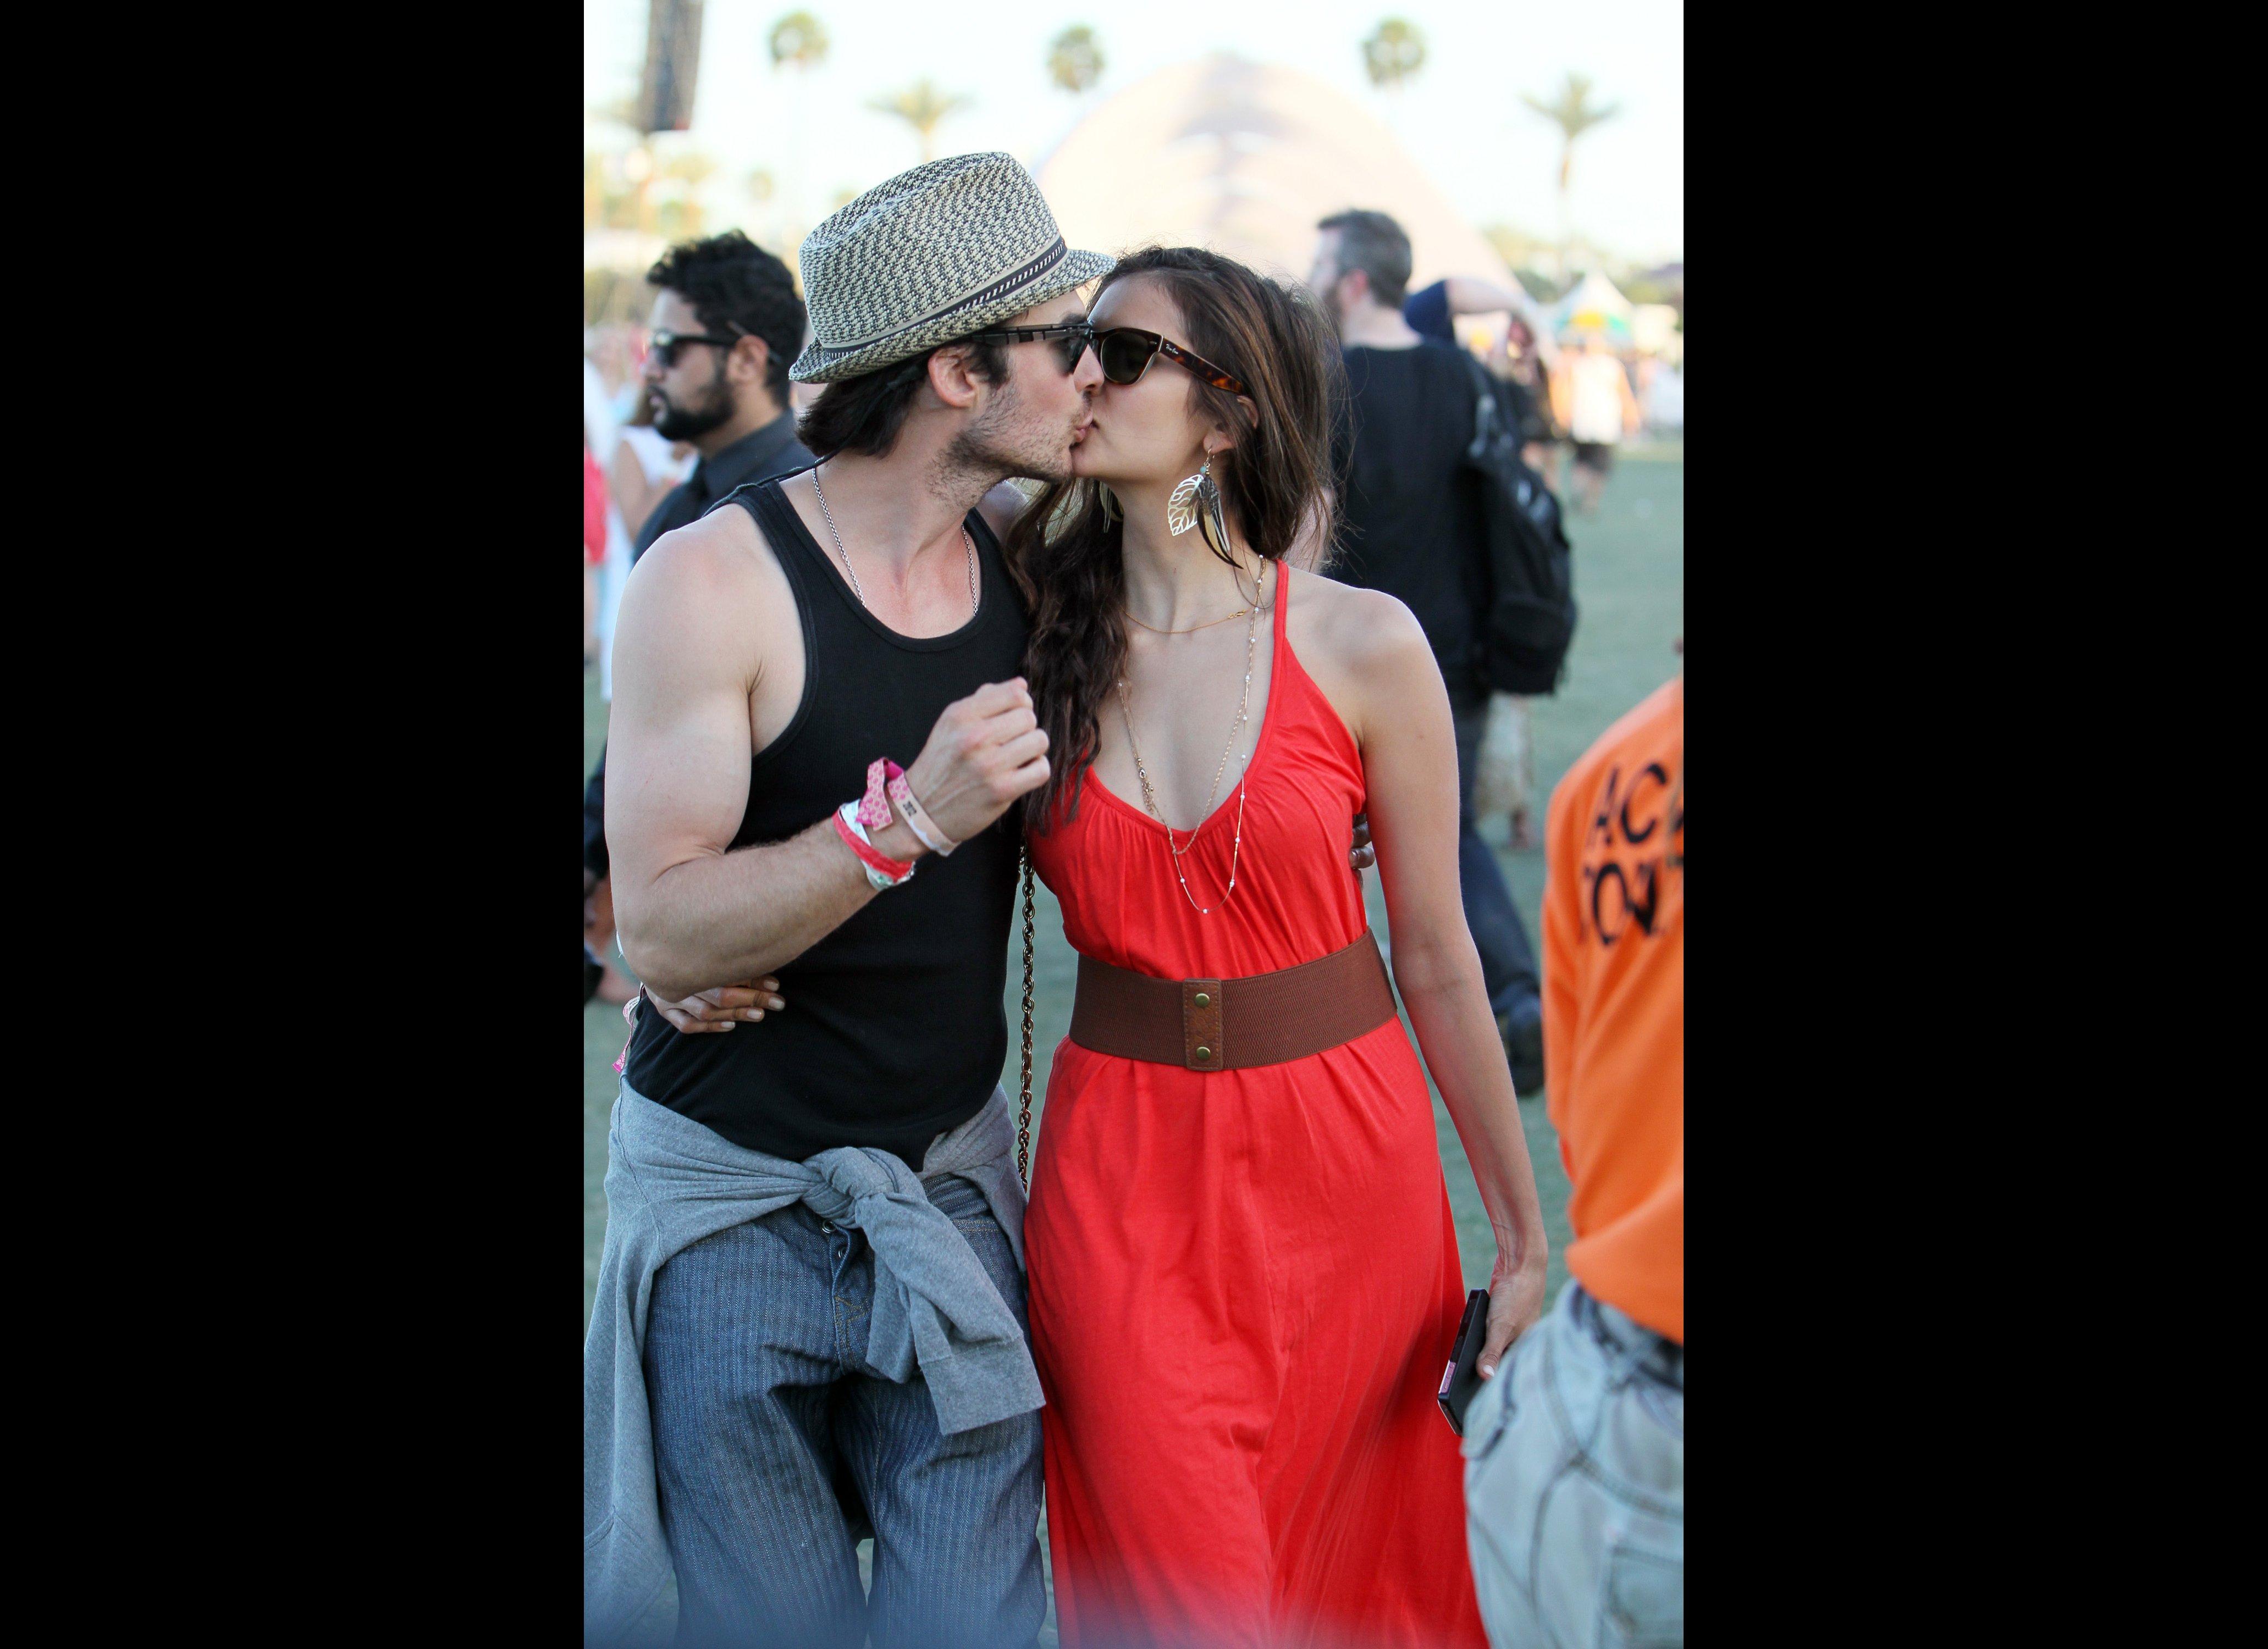 Will Adamowicz Ethnicity Lindsay Lohan Puts Recent Pictures Will Adamowicz Ethnicity